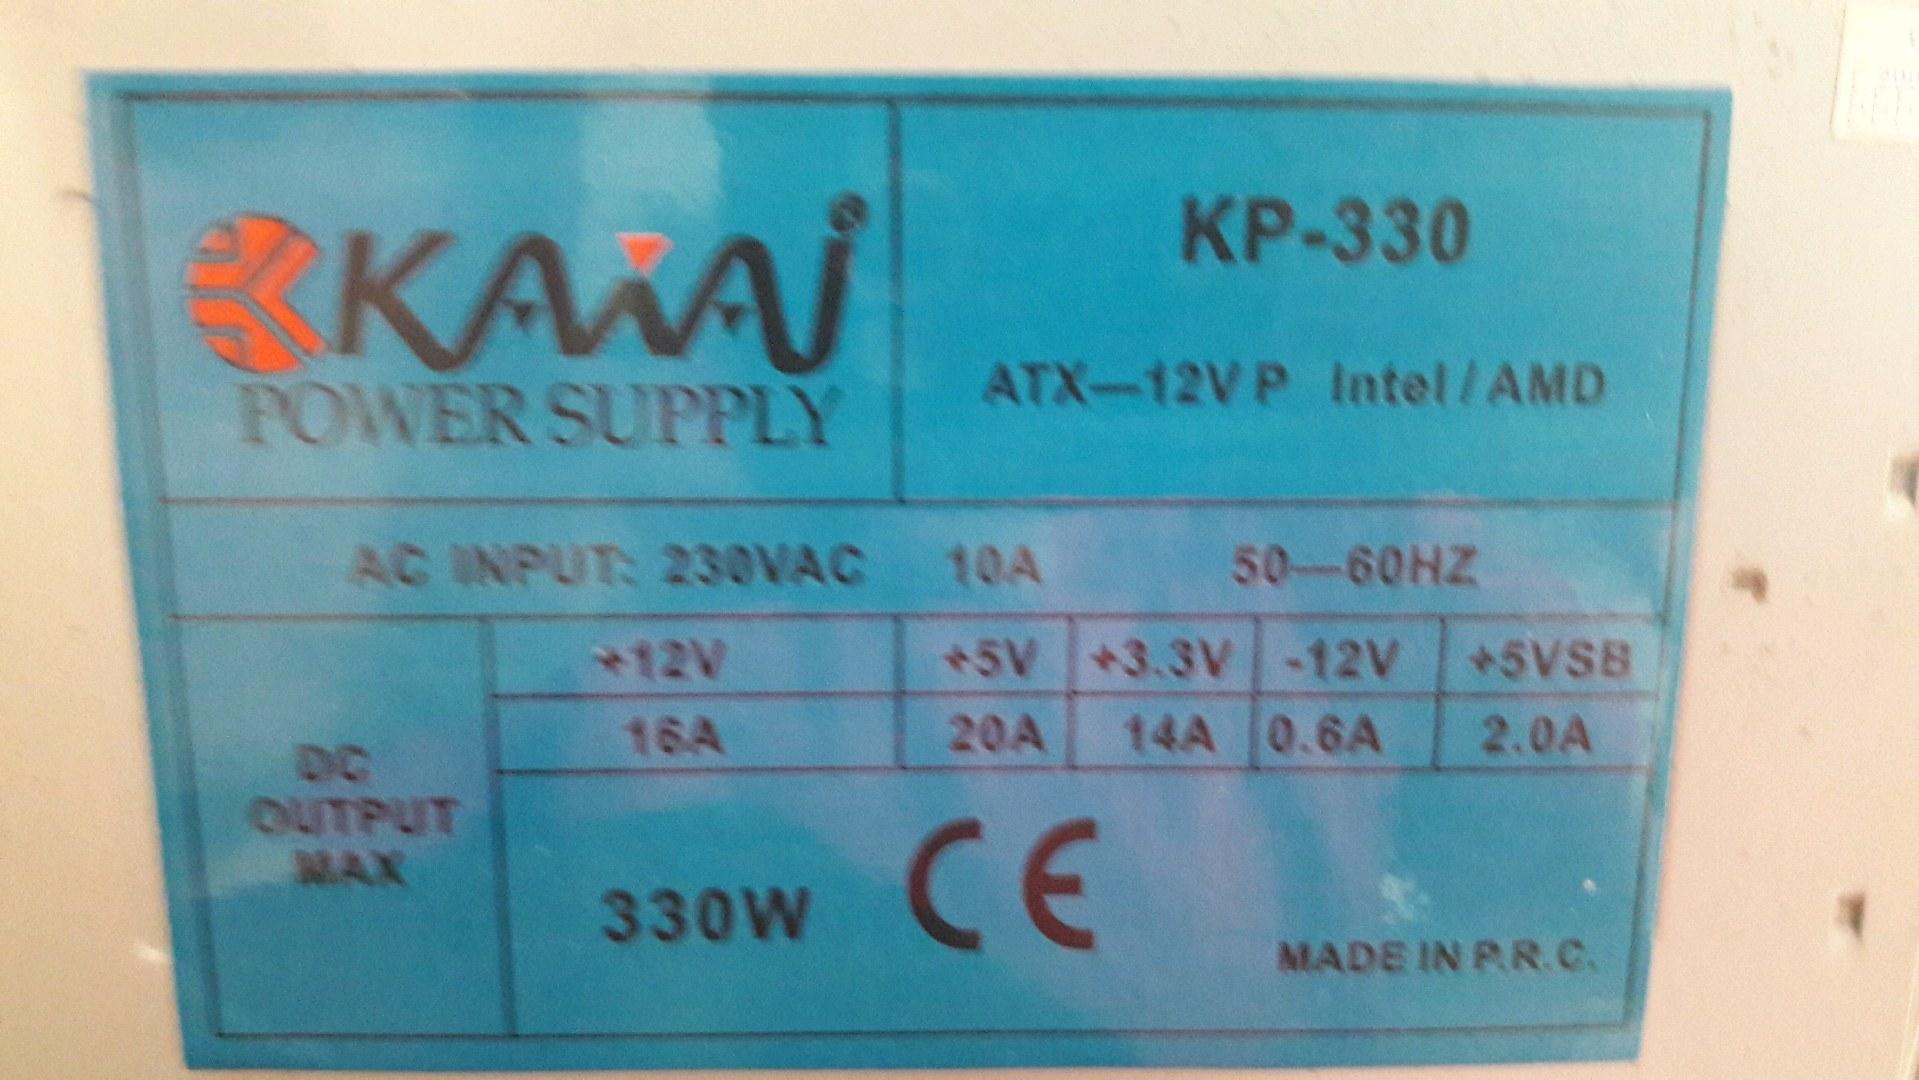 330w power supply